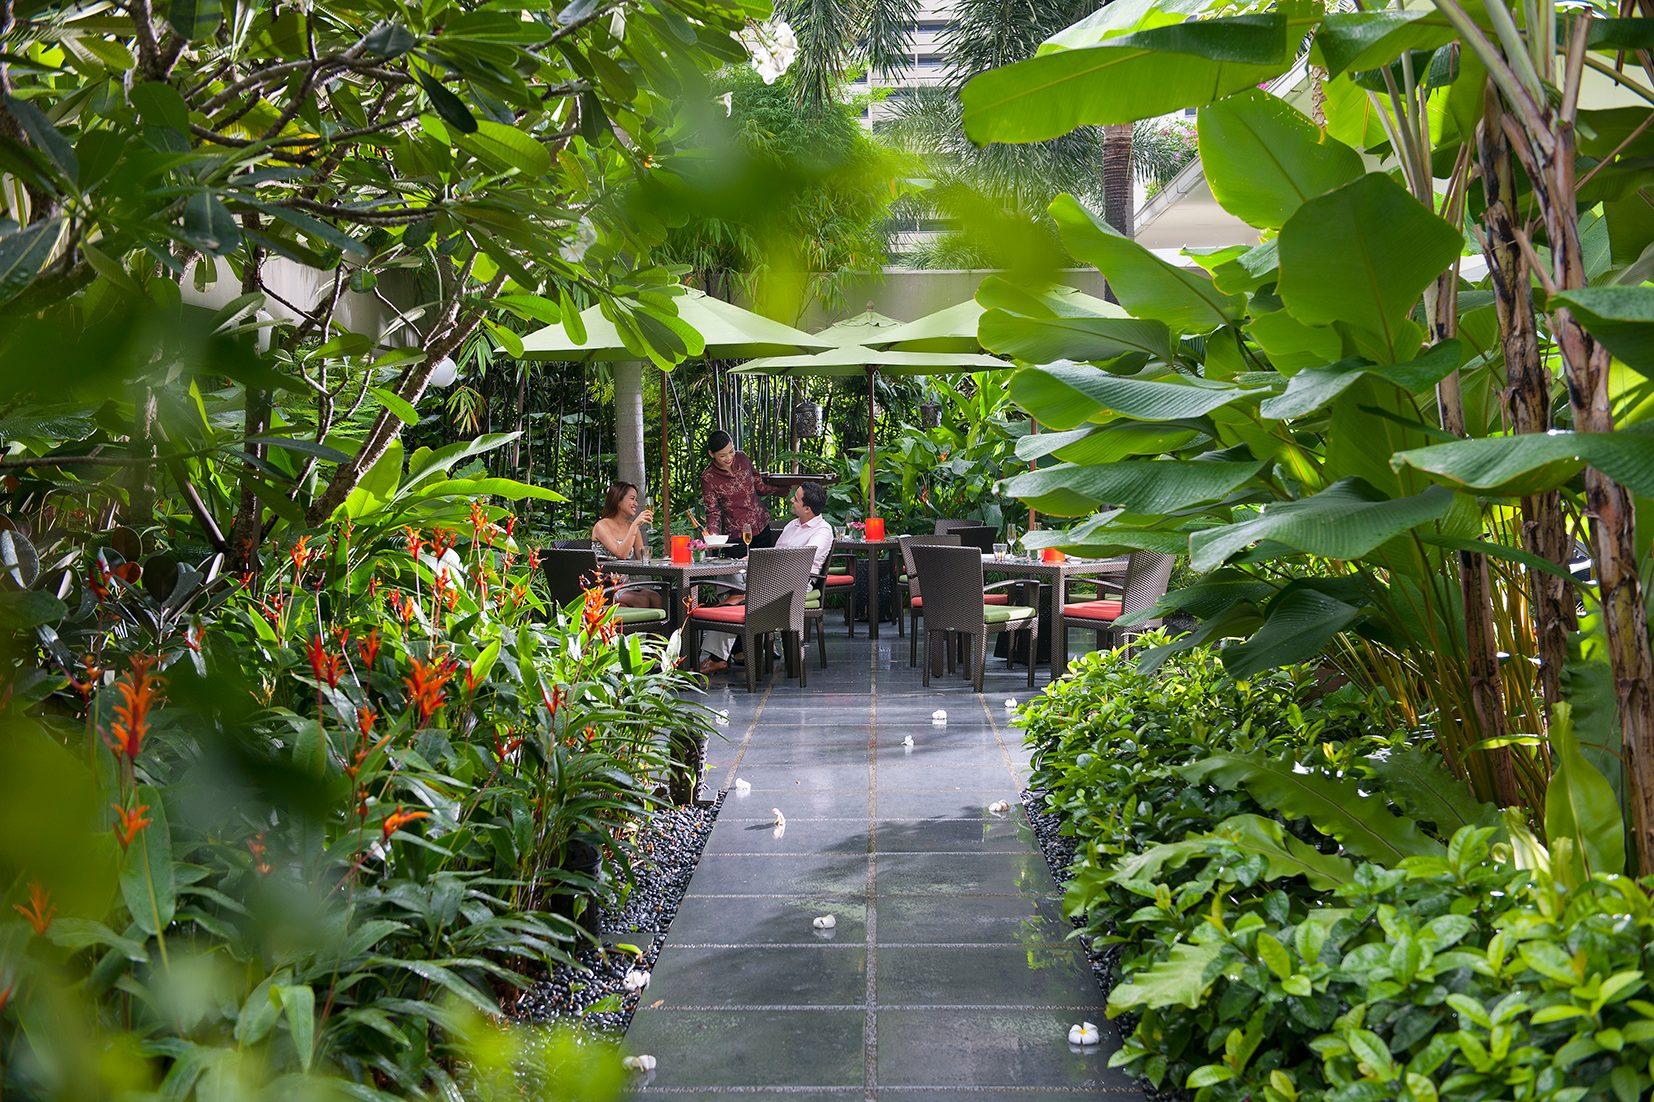 singapore-restaurant-melt-the-world-cafe-service-3-2.jpg